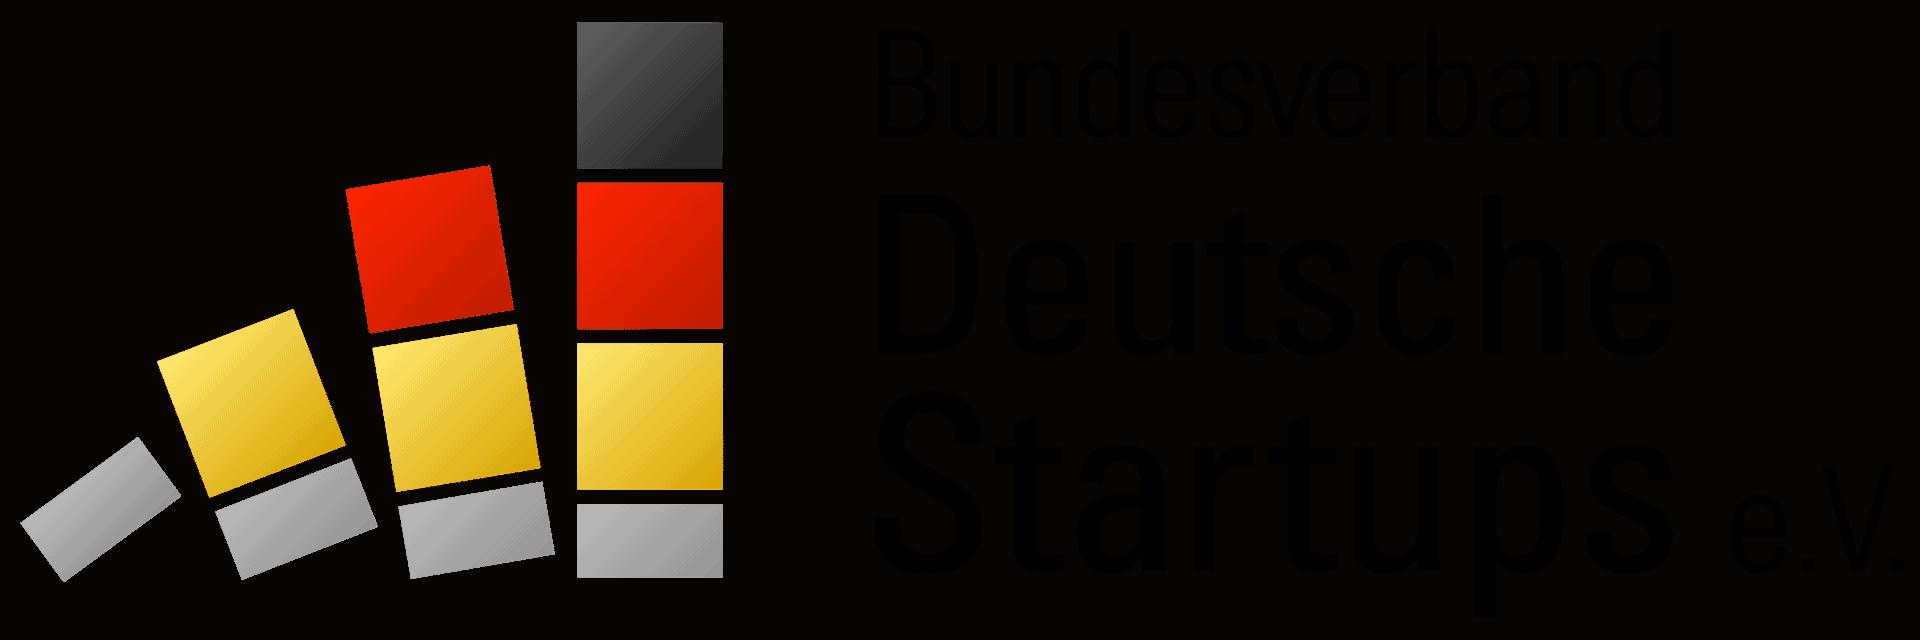 Bundesverband-Dt-Startups-Logo